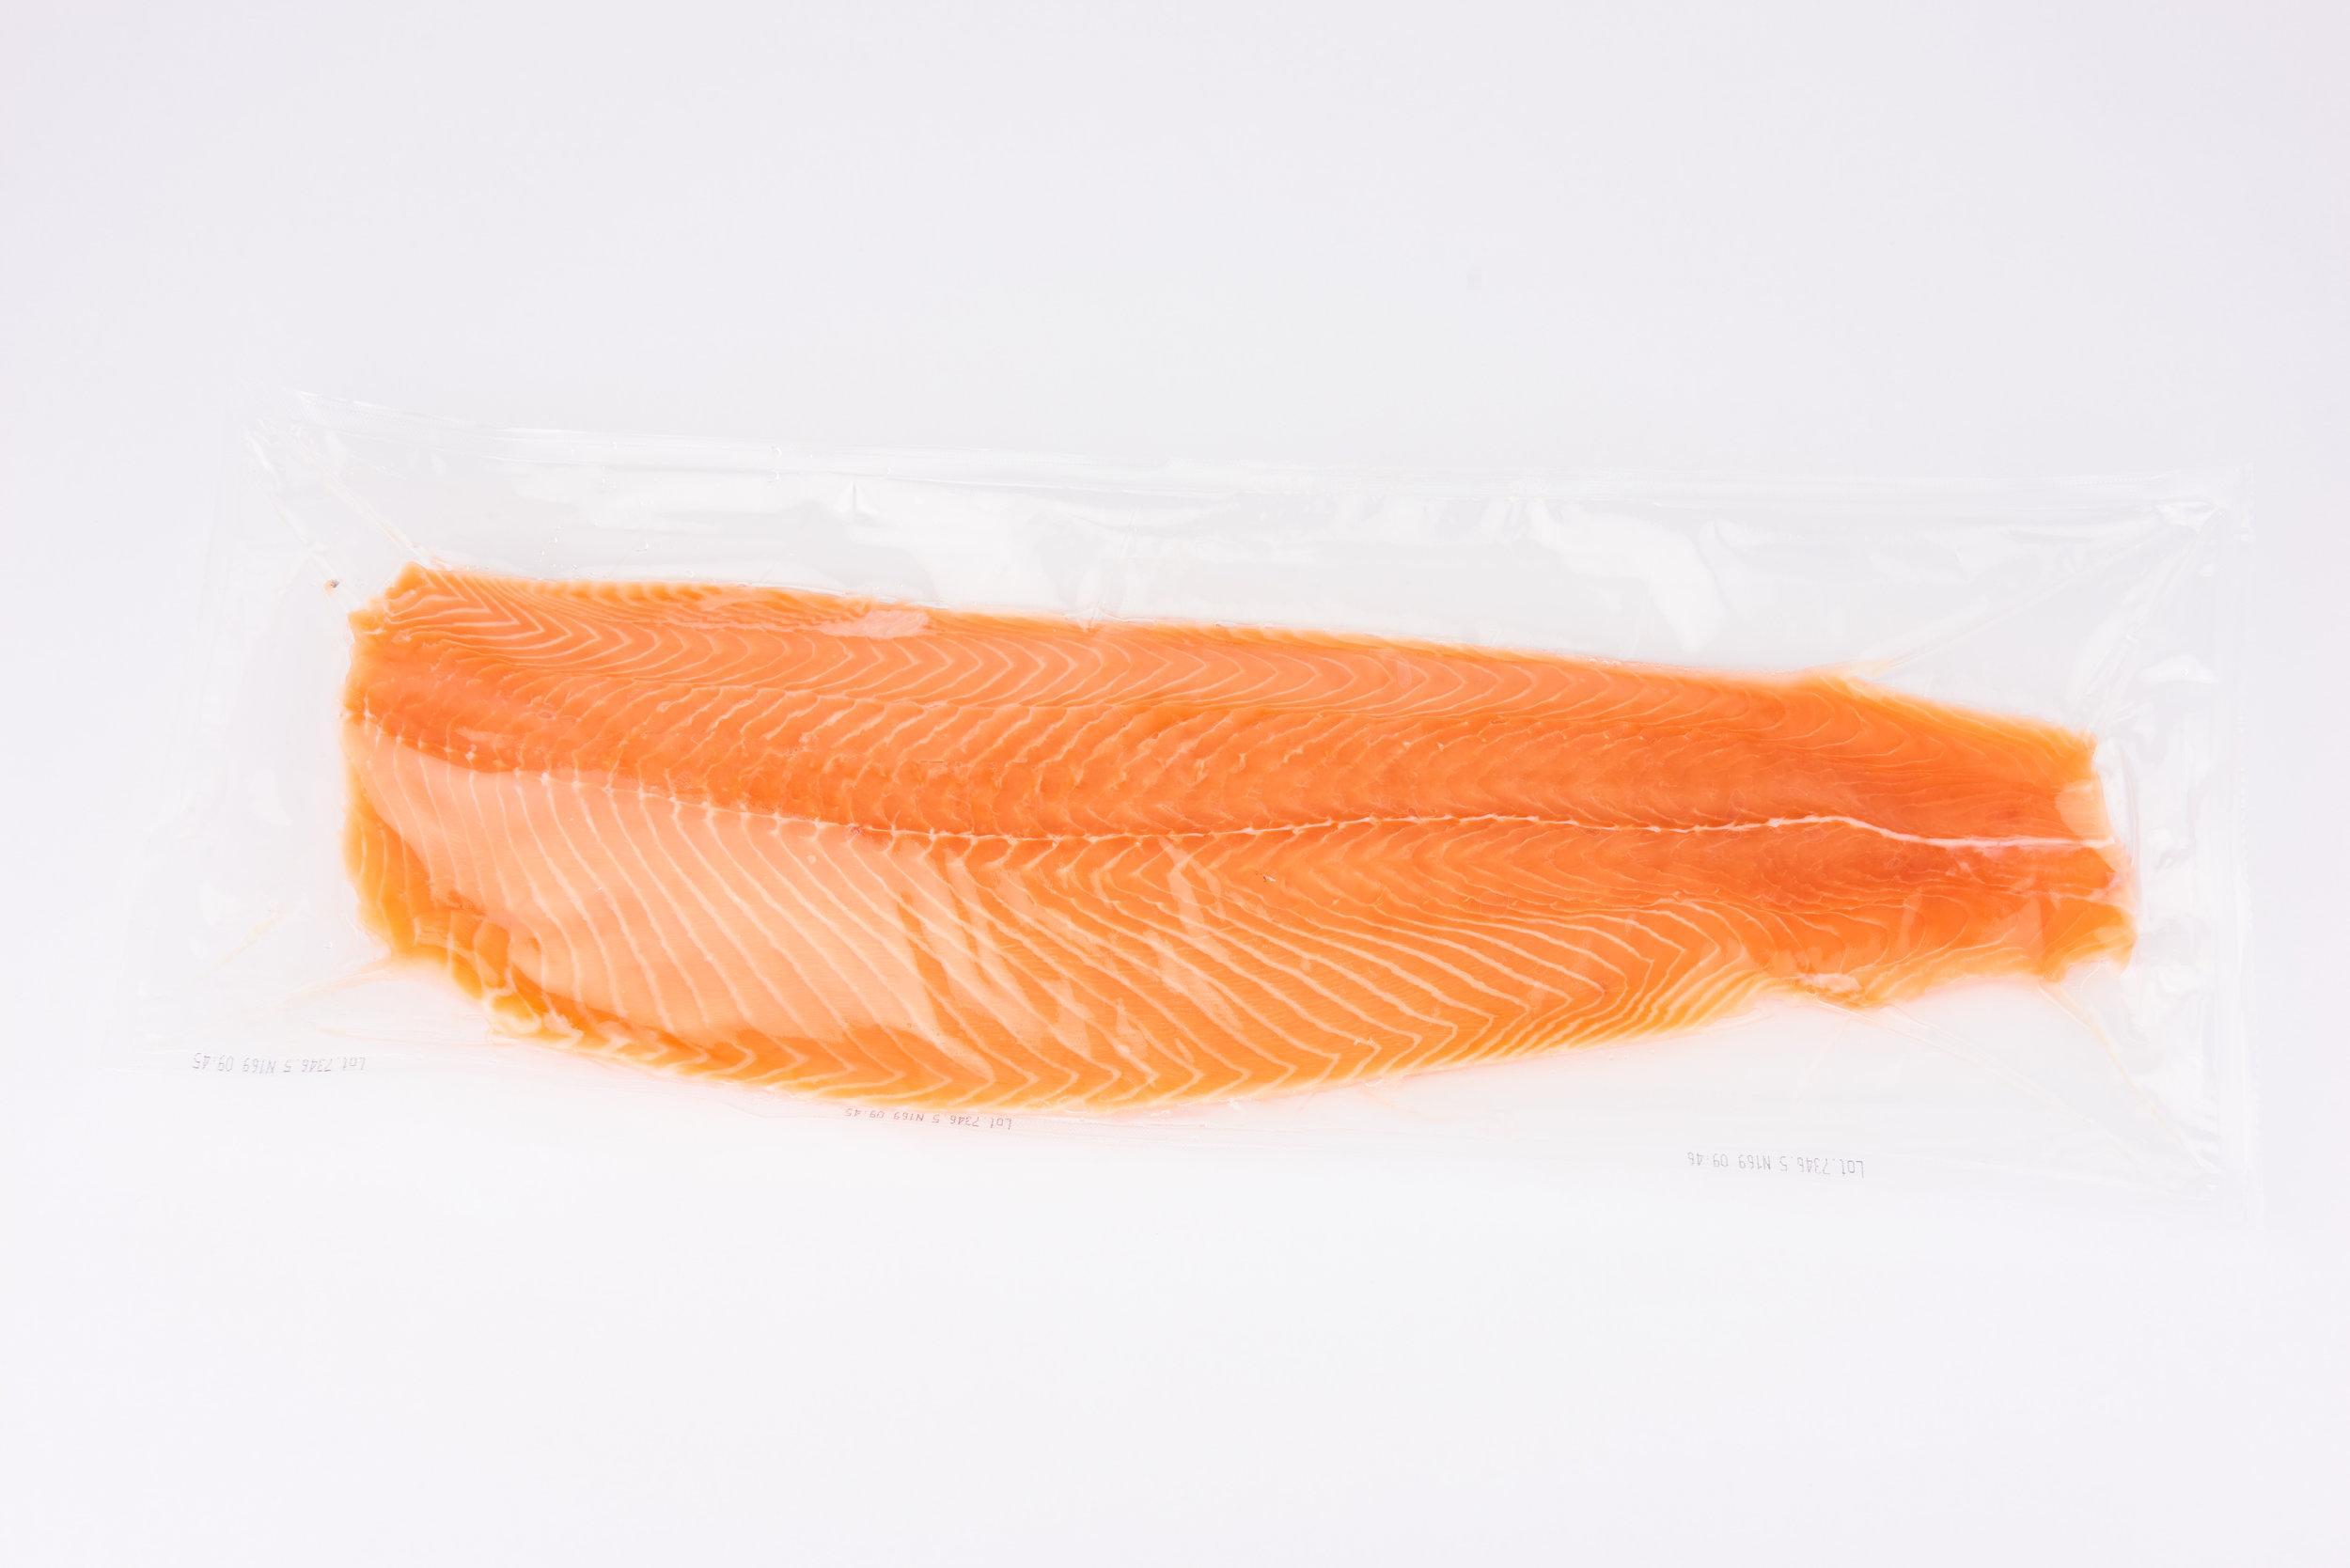 Whole fresh fillet (IVP)   A-E trim, boneless, individually vacuum packed (IVP), graded sizes.